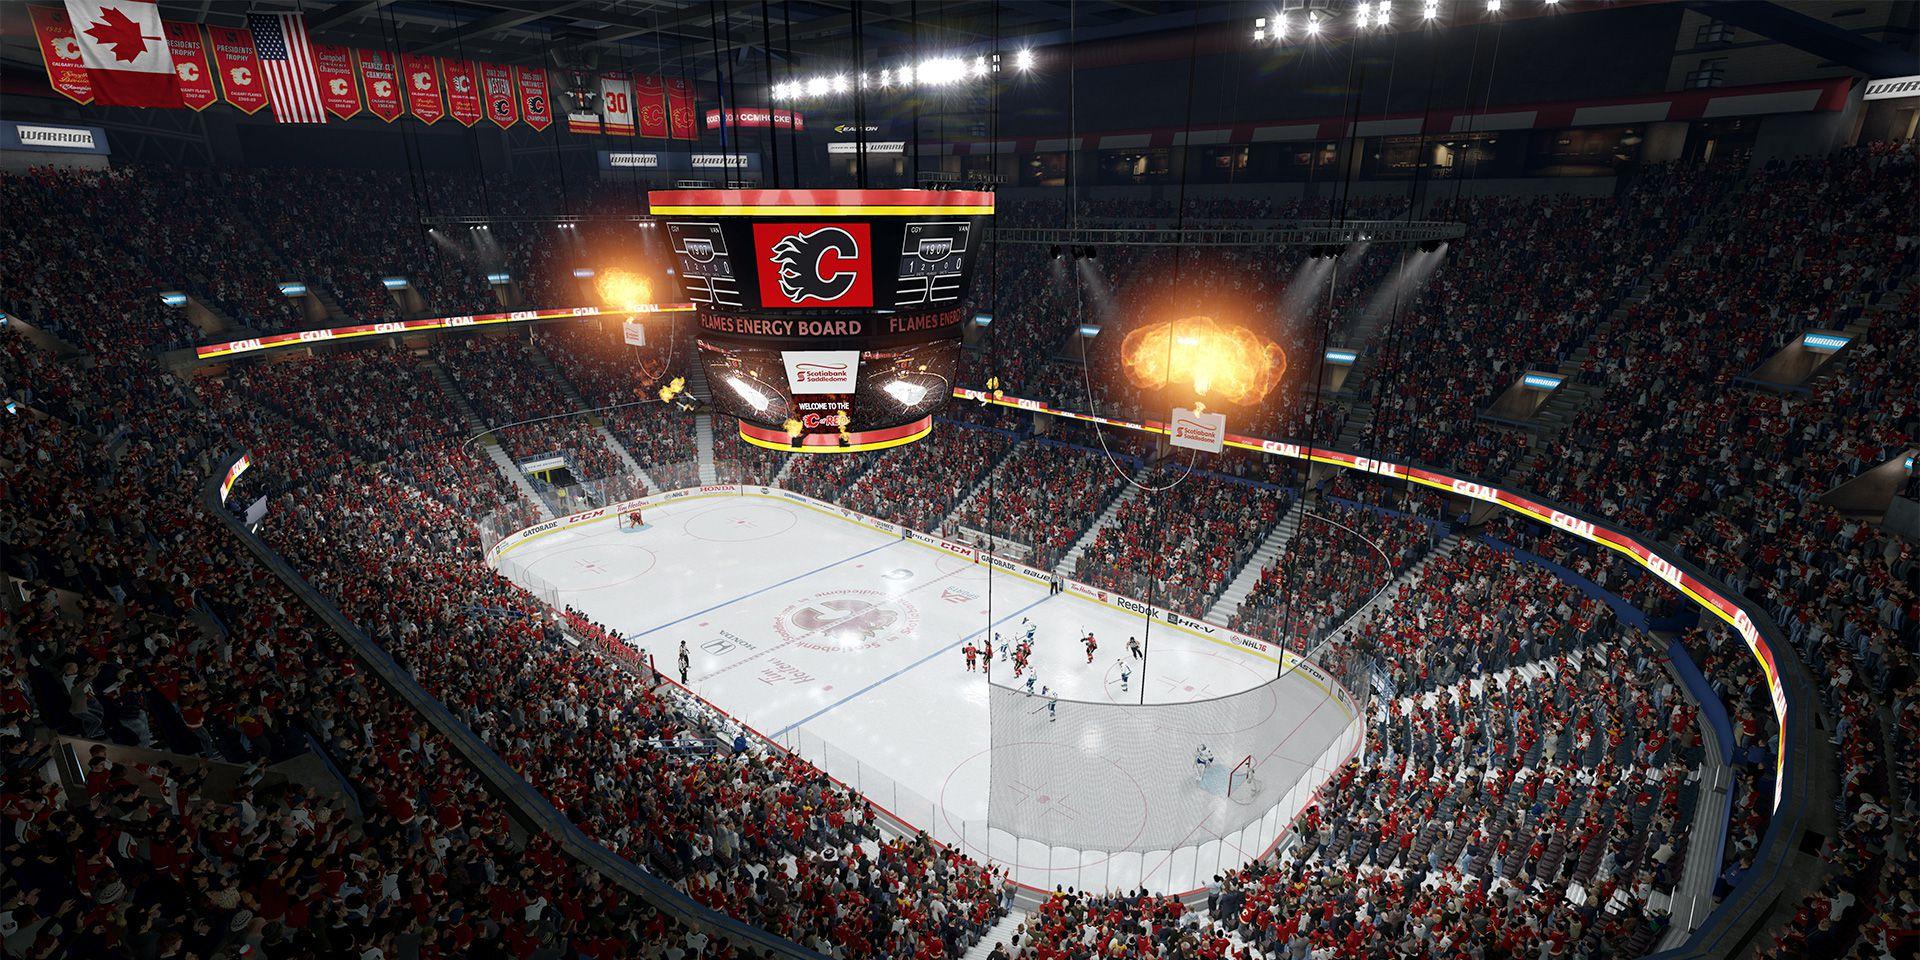 NHL 16 - CGY arena screenshot 1920